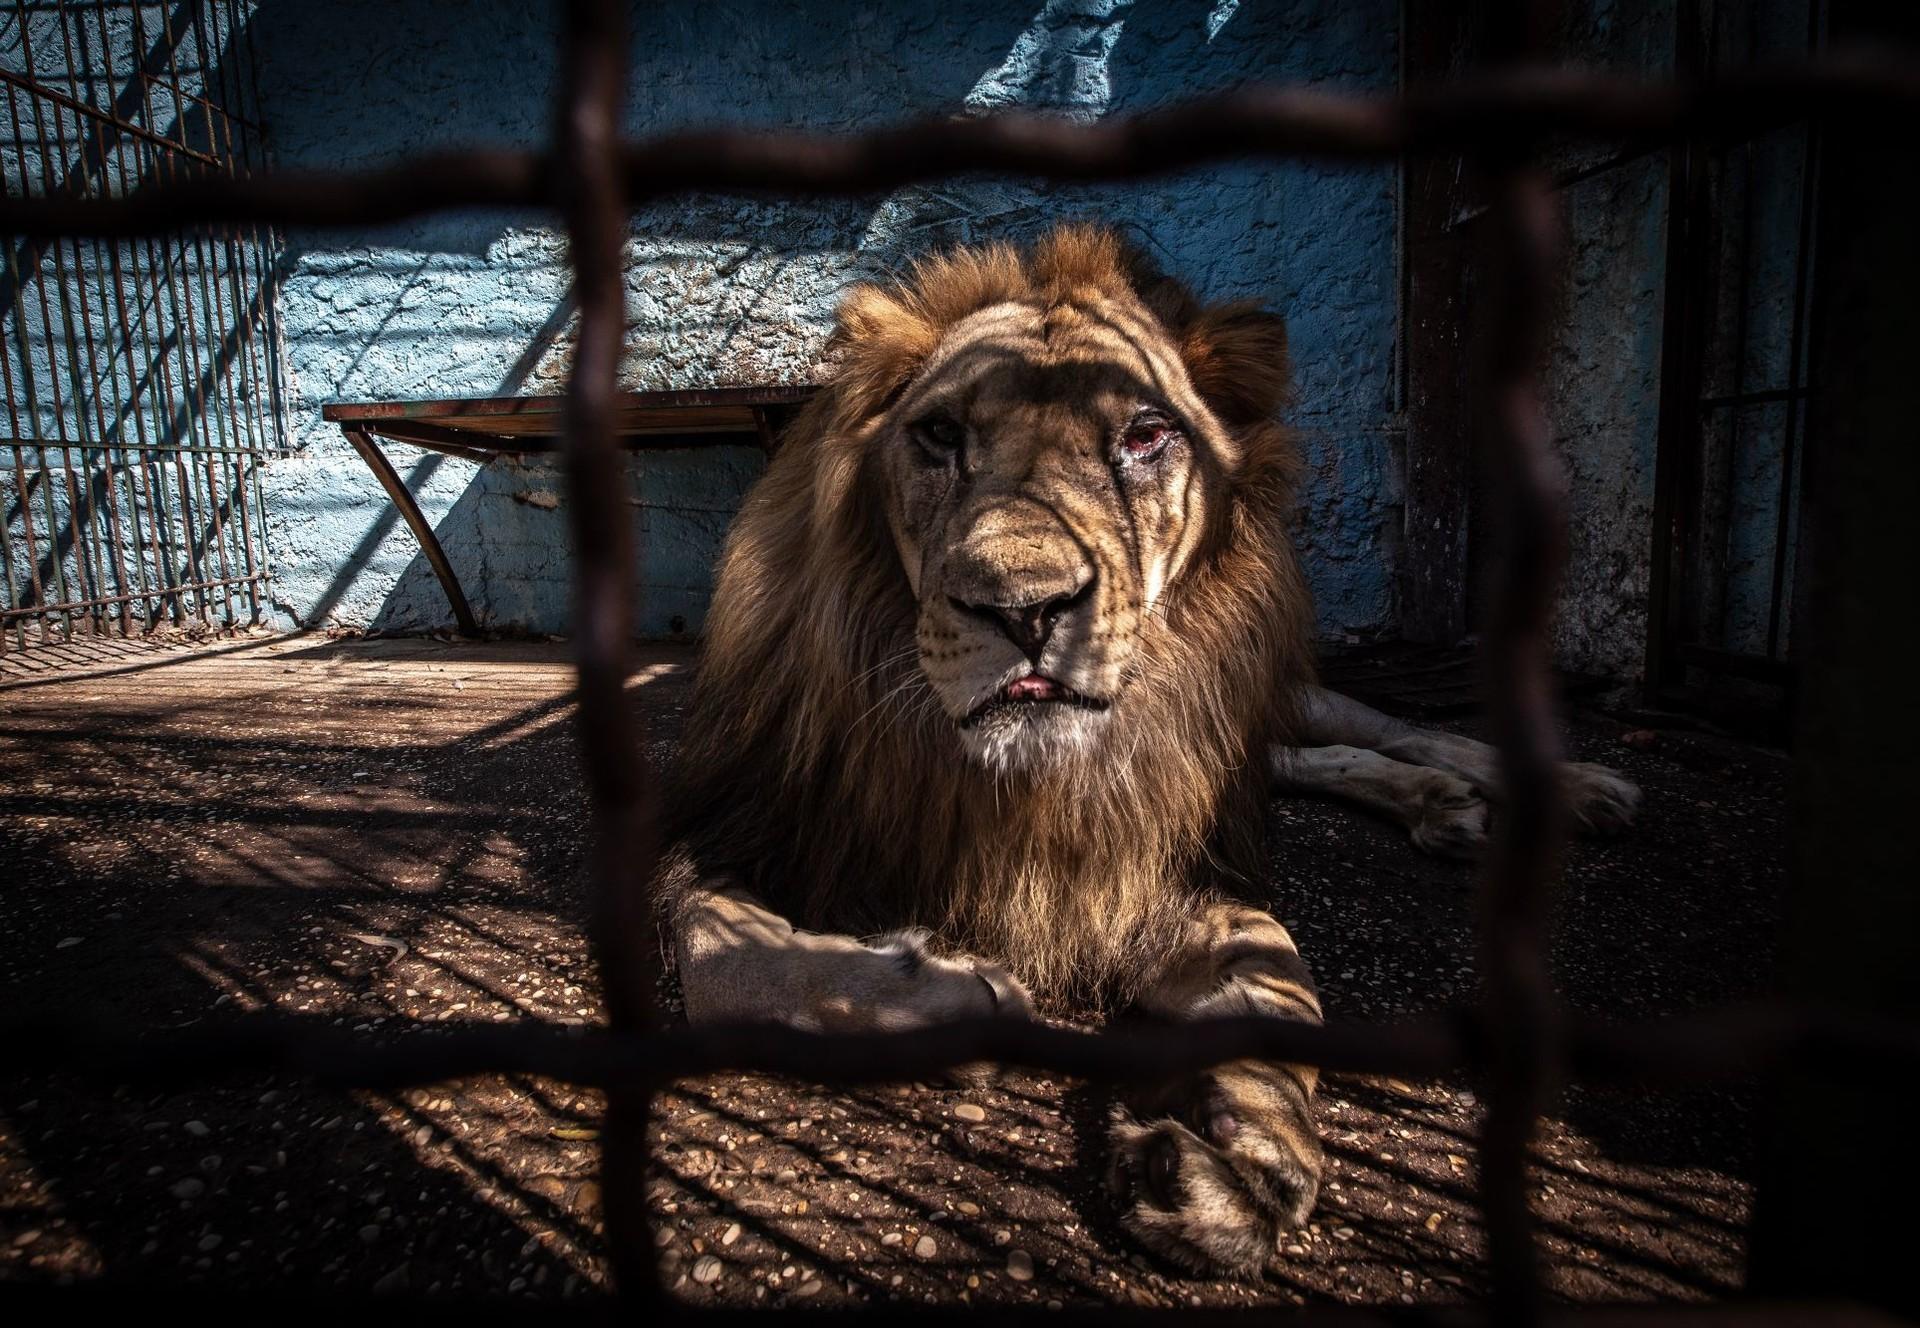 No More Fier Zoo (c) David Wilson